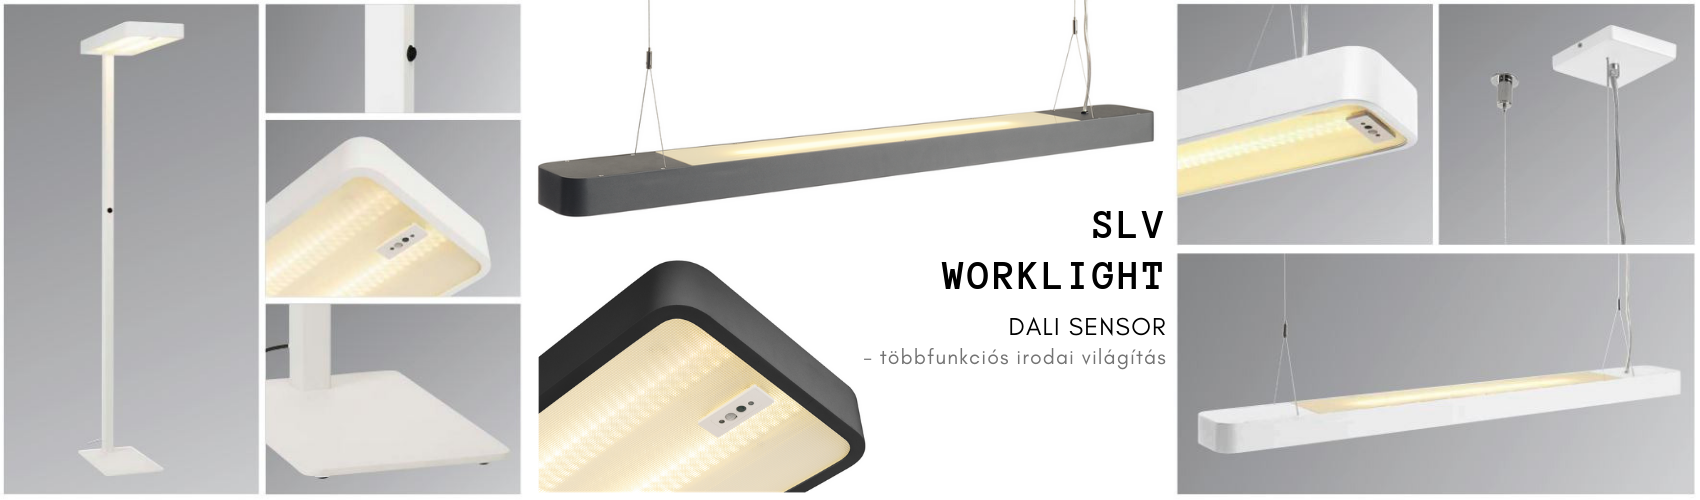 SLV Worklight dali sensor - irodai világítás